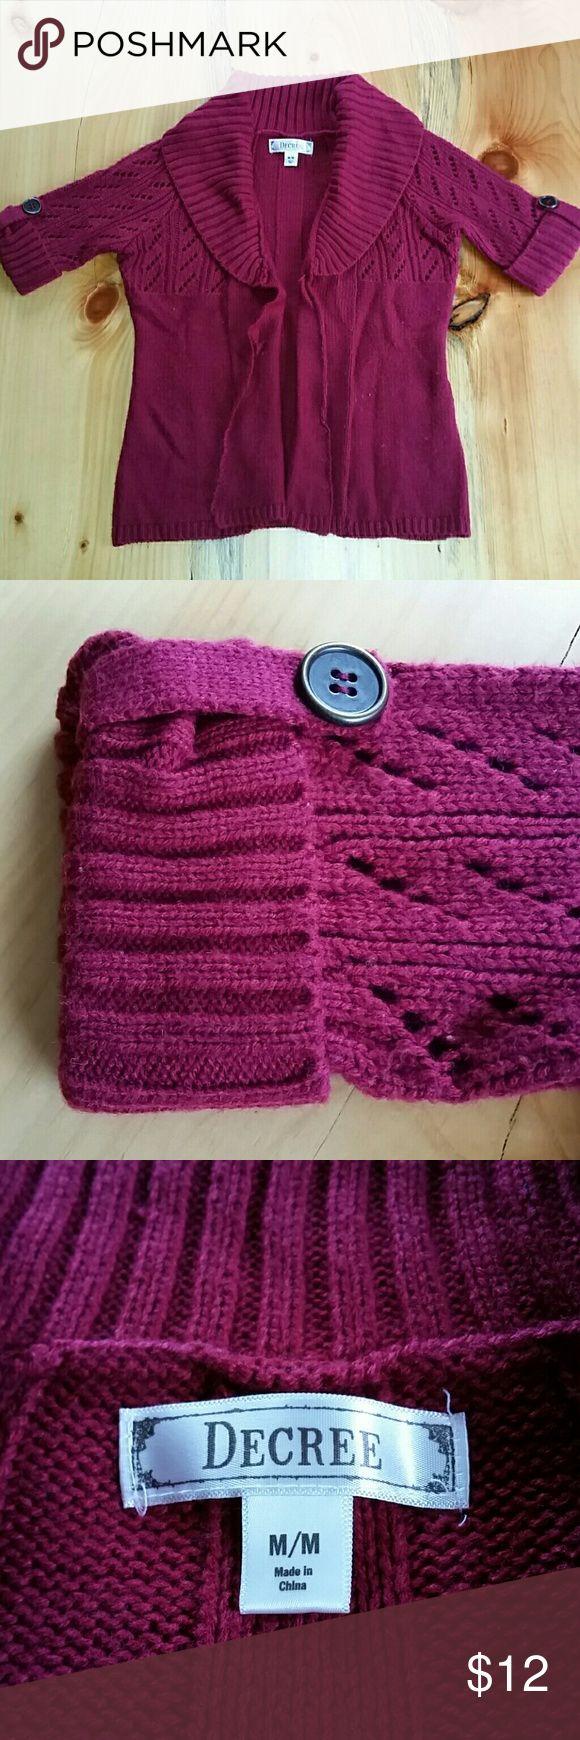 Women's Decree Sweater Beautiful sweater, Clothes design